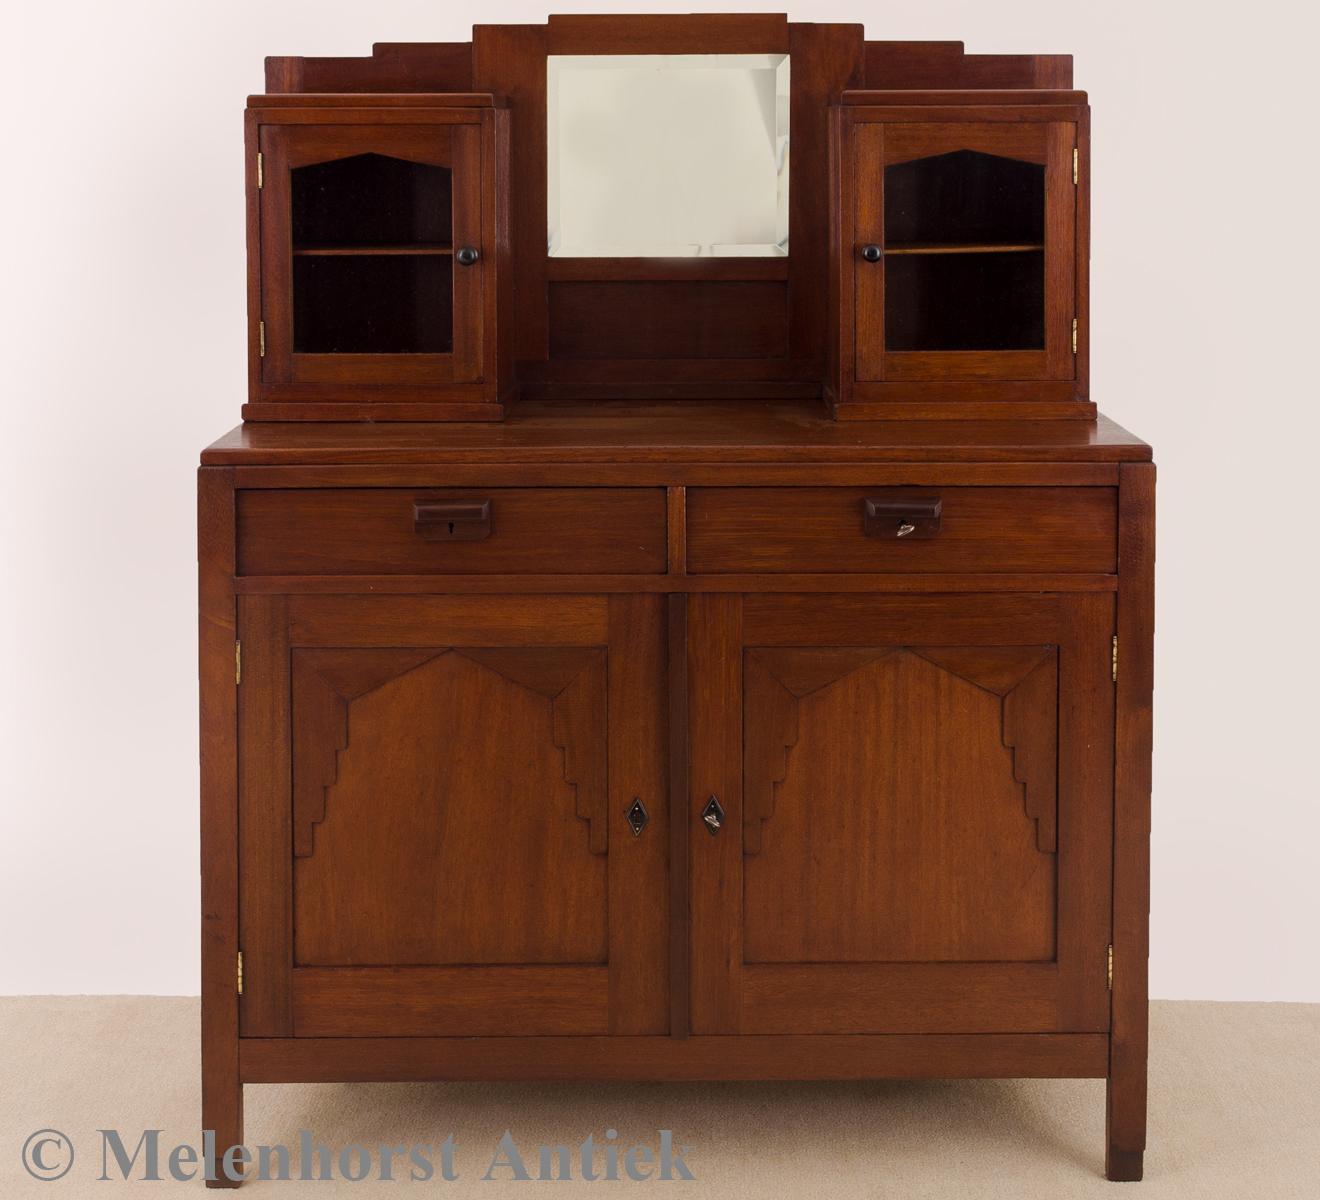 antike anrichte antike uhren melenhorst. Black Bedroom Furniture Sets. Home Design Ideas